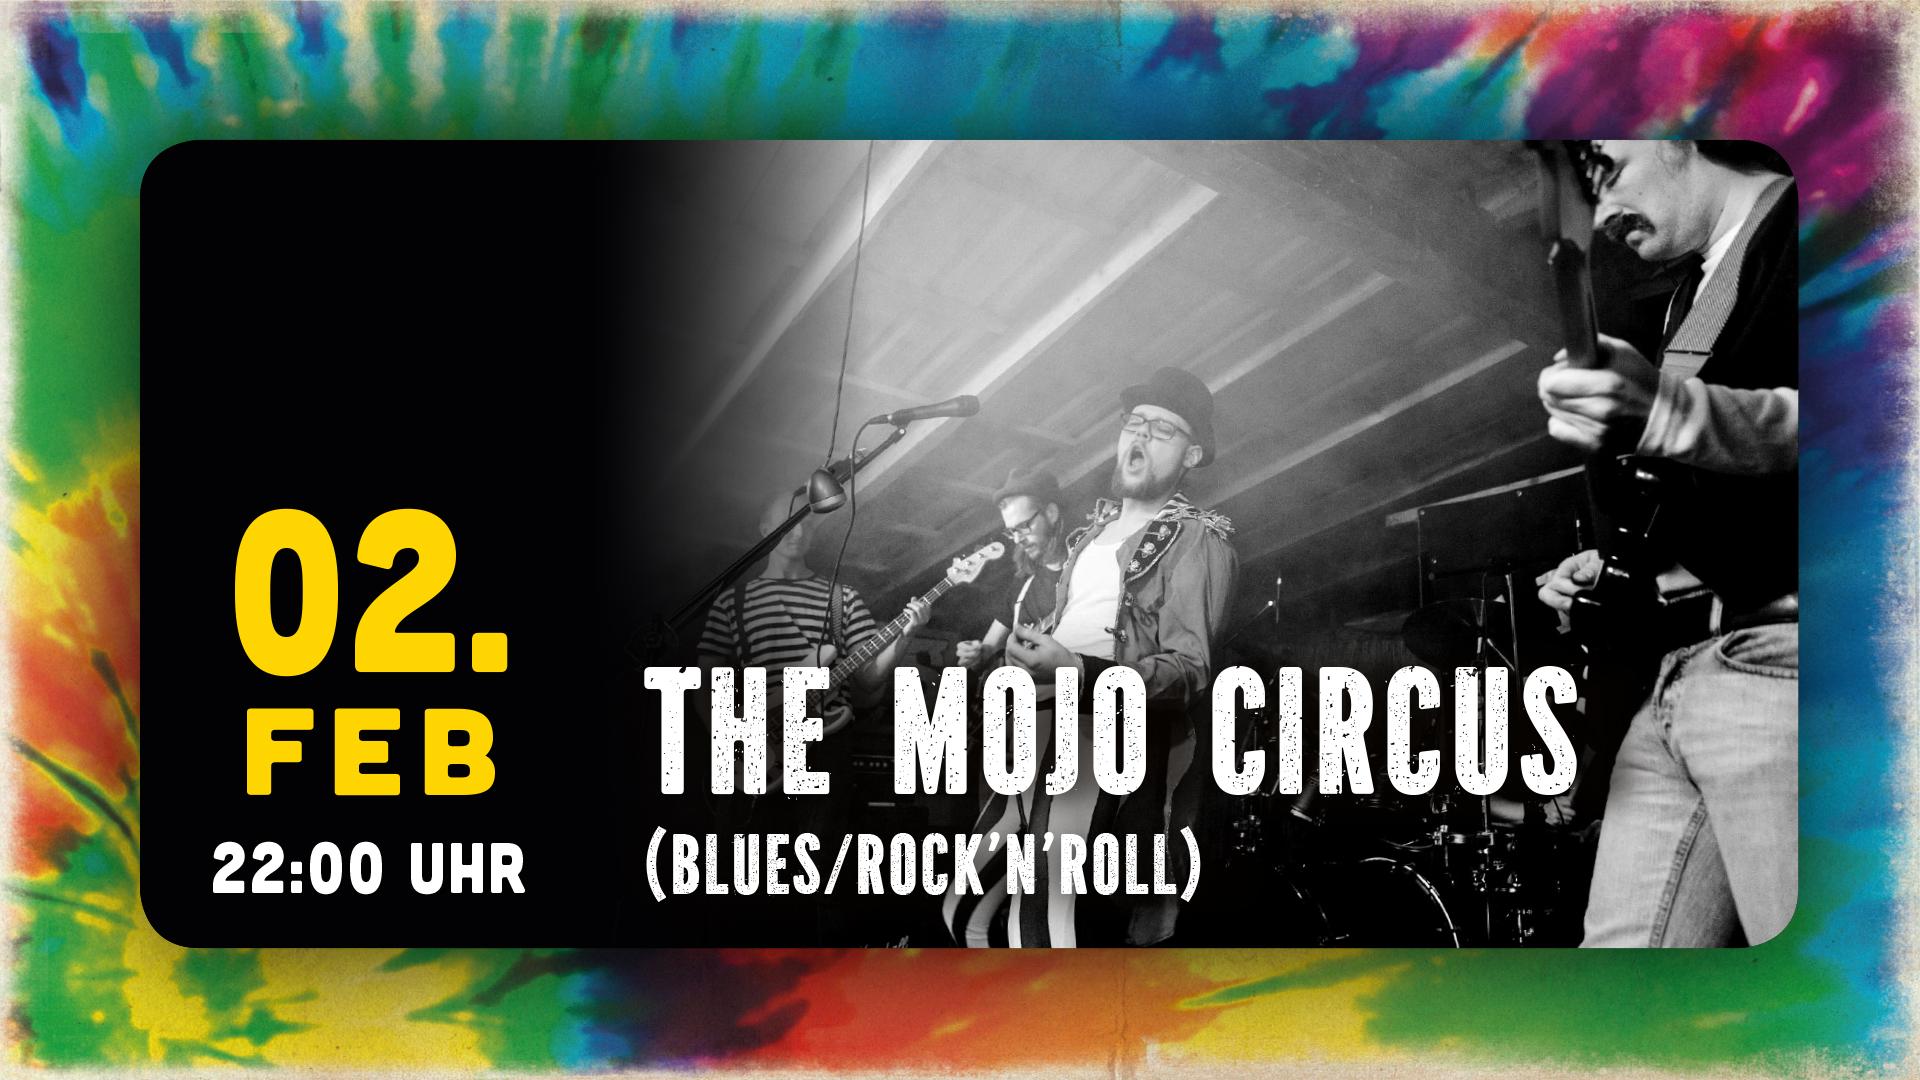 The Mojo Circus